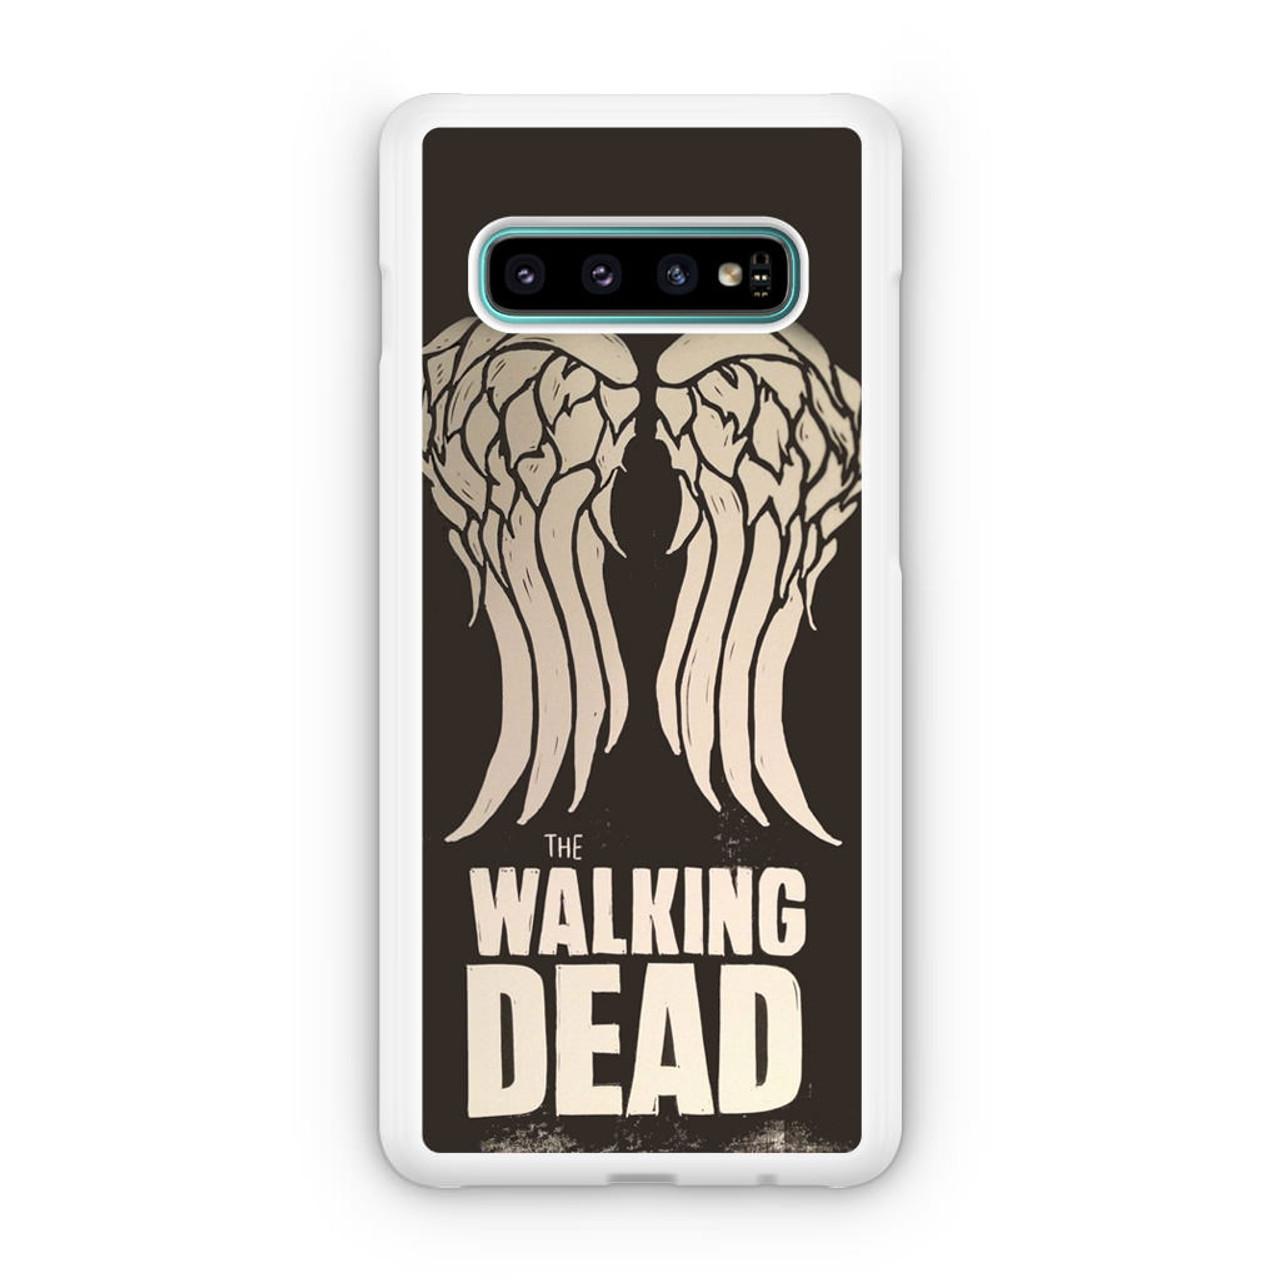 The Walking Dead Daryl Dixon Wings Samsung Galaxy Note 10 Case